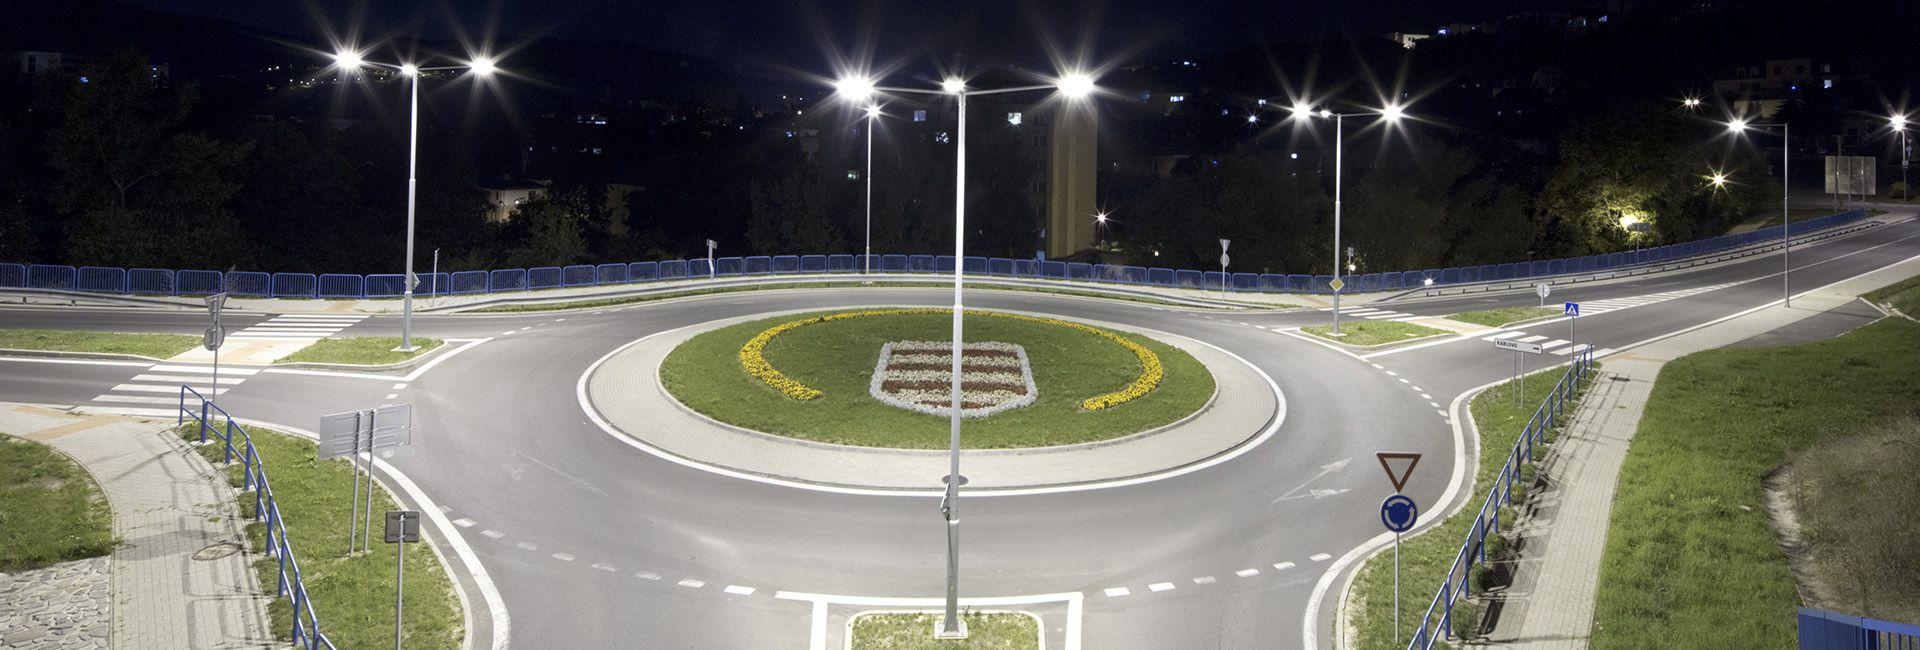 Luminarias viales LED iluminando rotonda